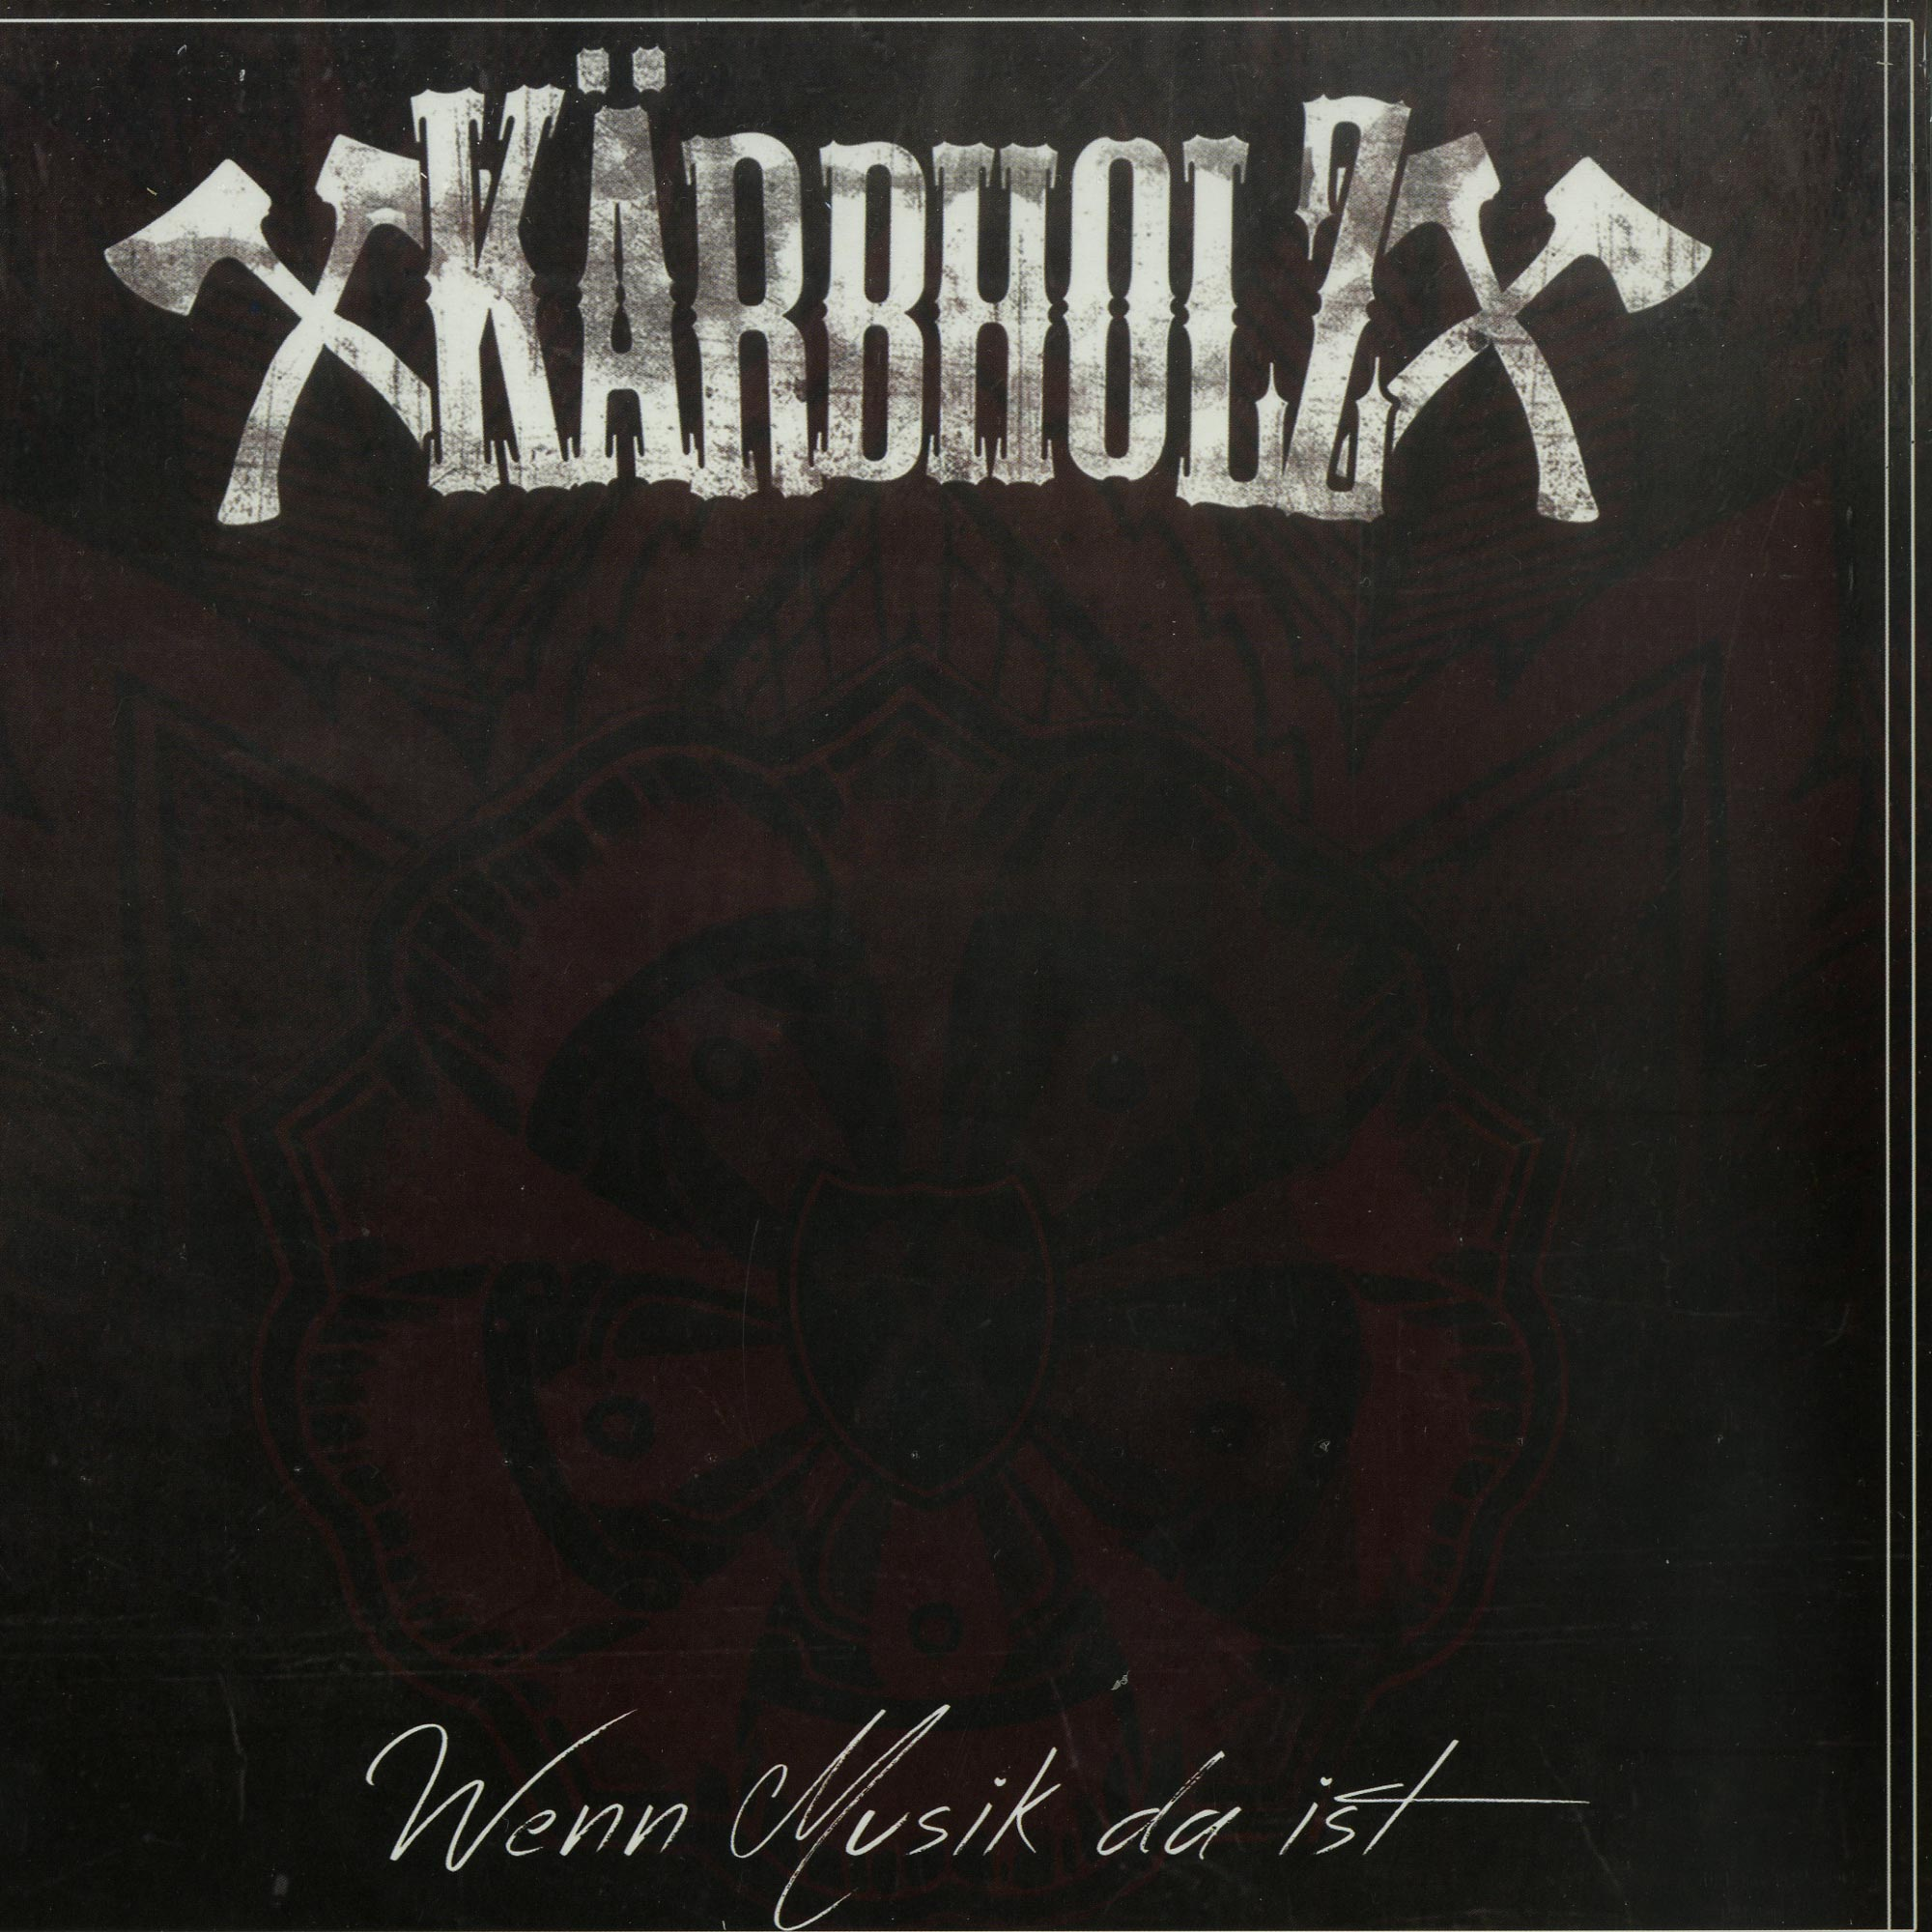 Kaerbholz - WENN MUSIK DA IST